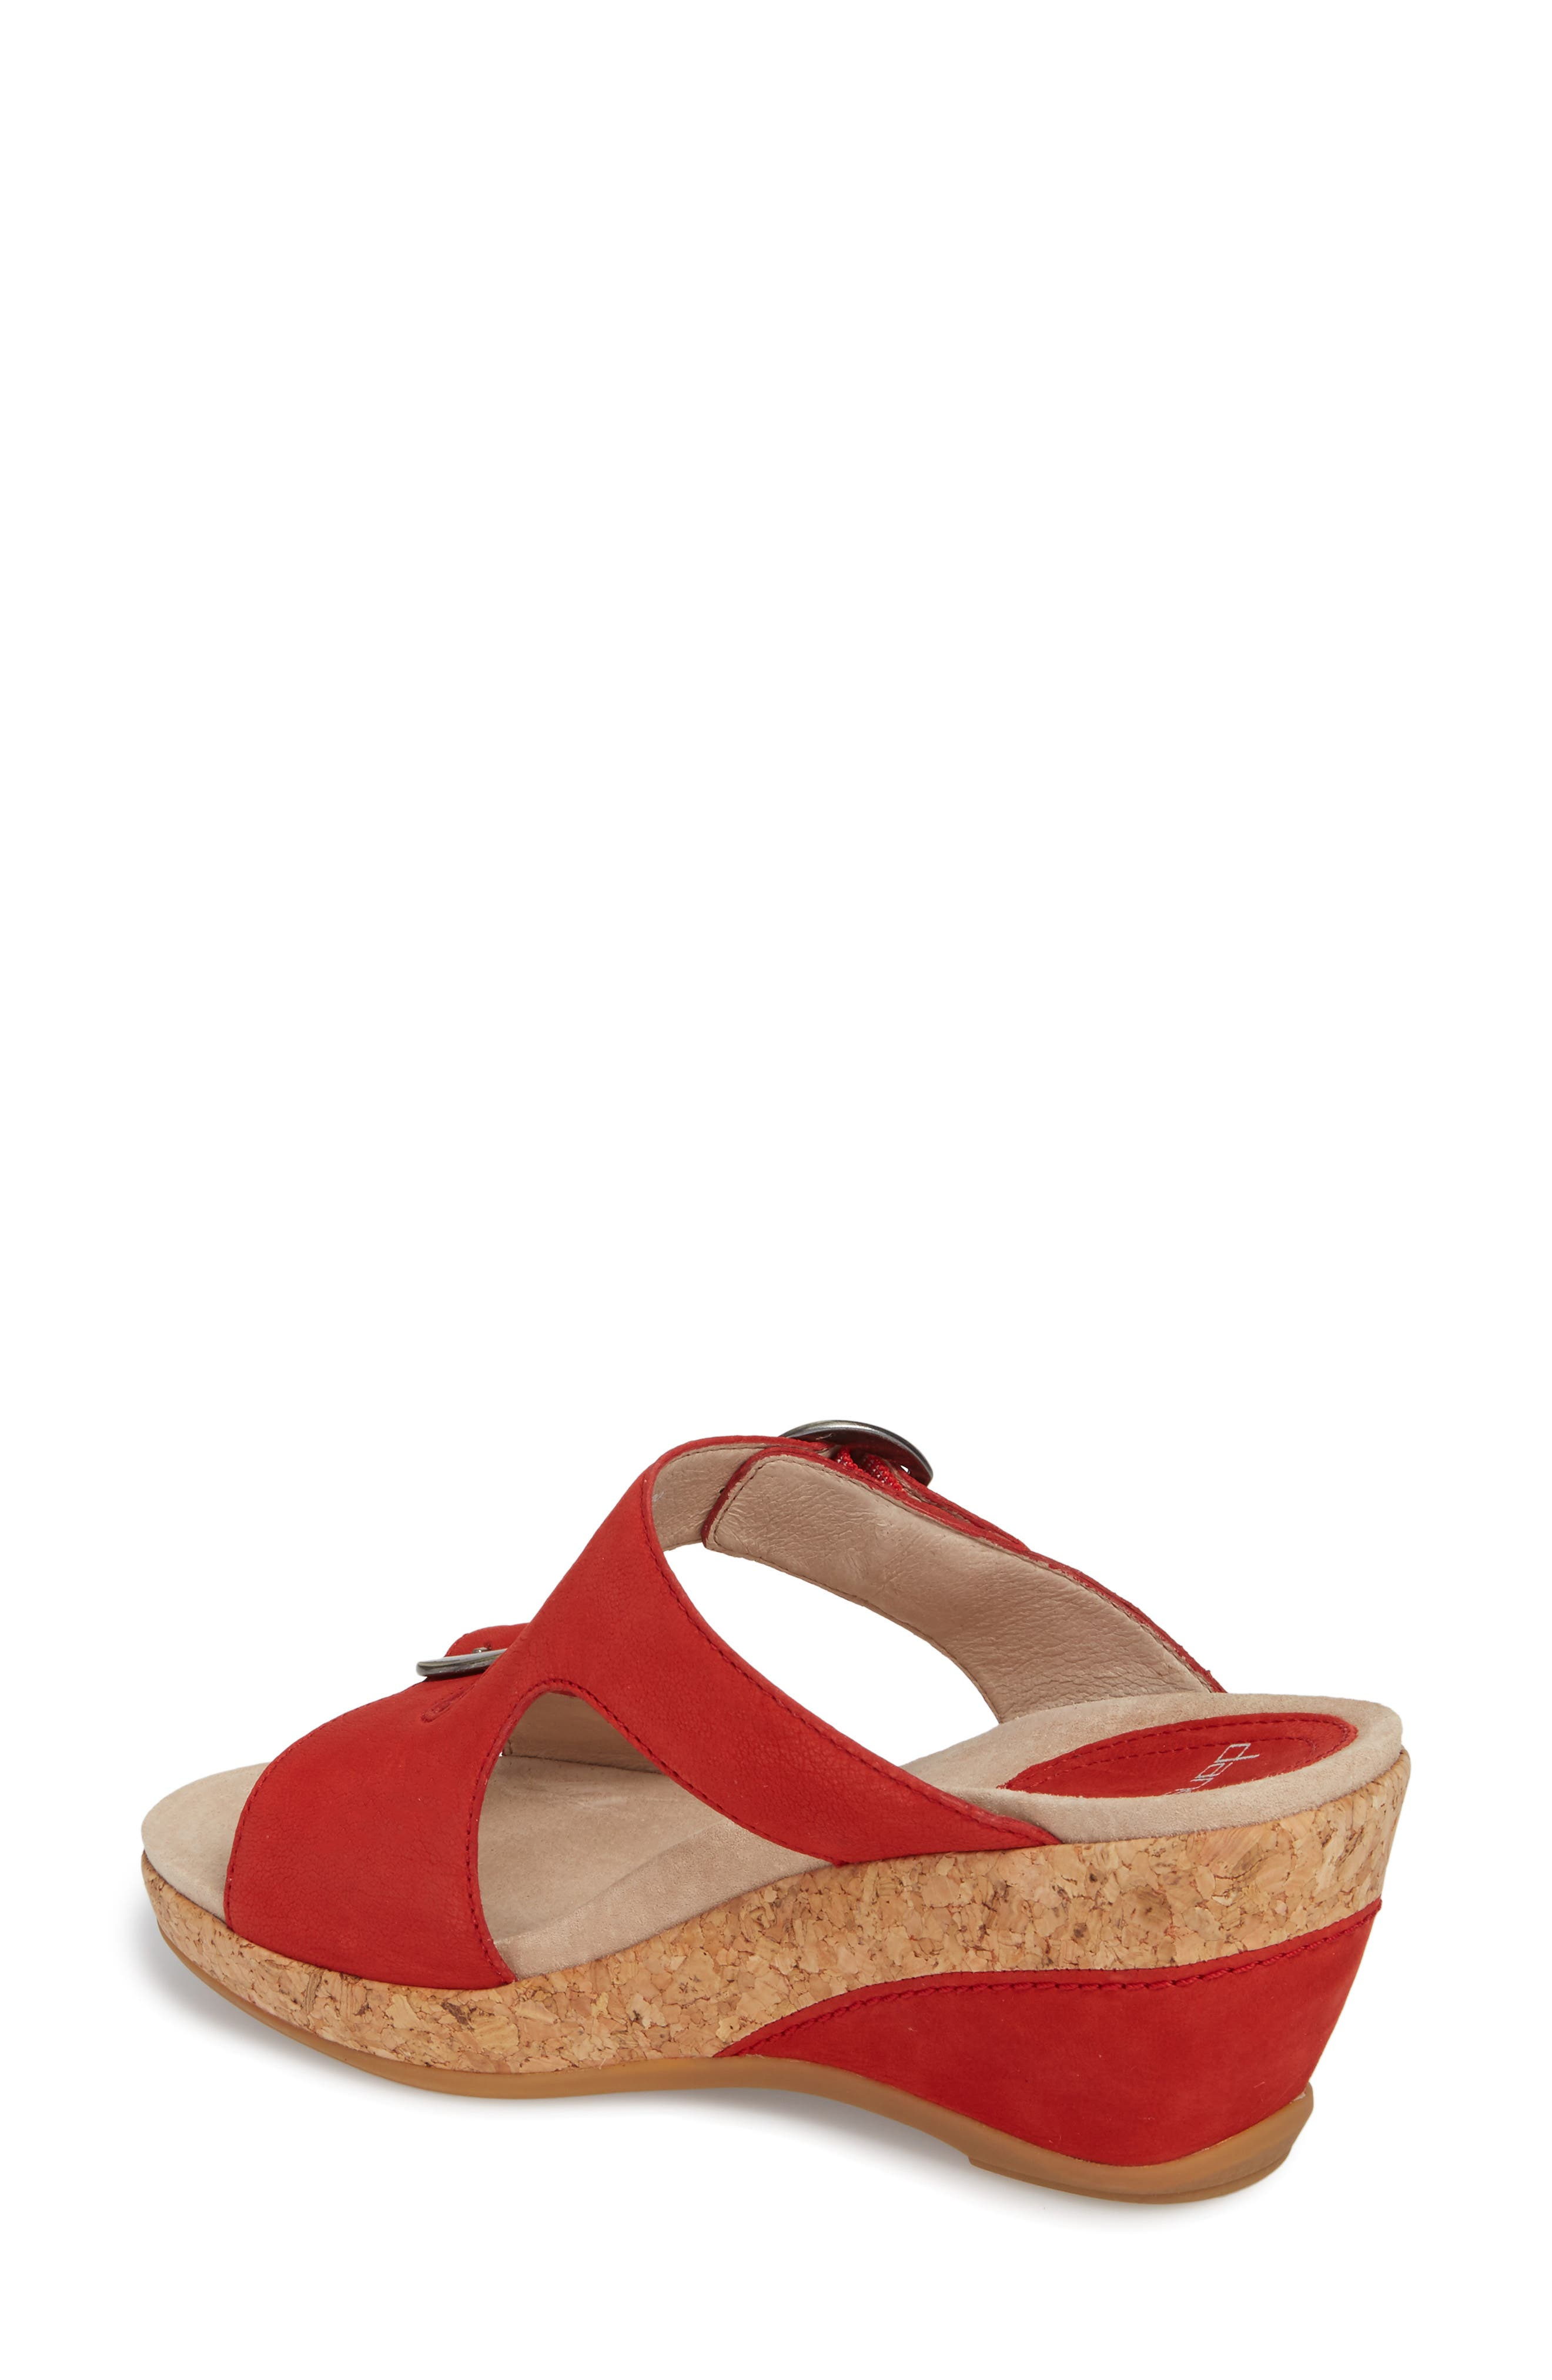 Carla Wedge Slide Sandal,                             Alternate thumbnail 2, color,                             Tomato Milled Nubuck Leather